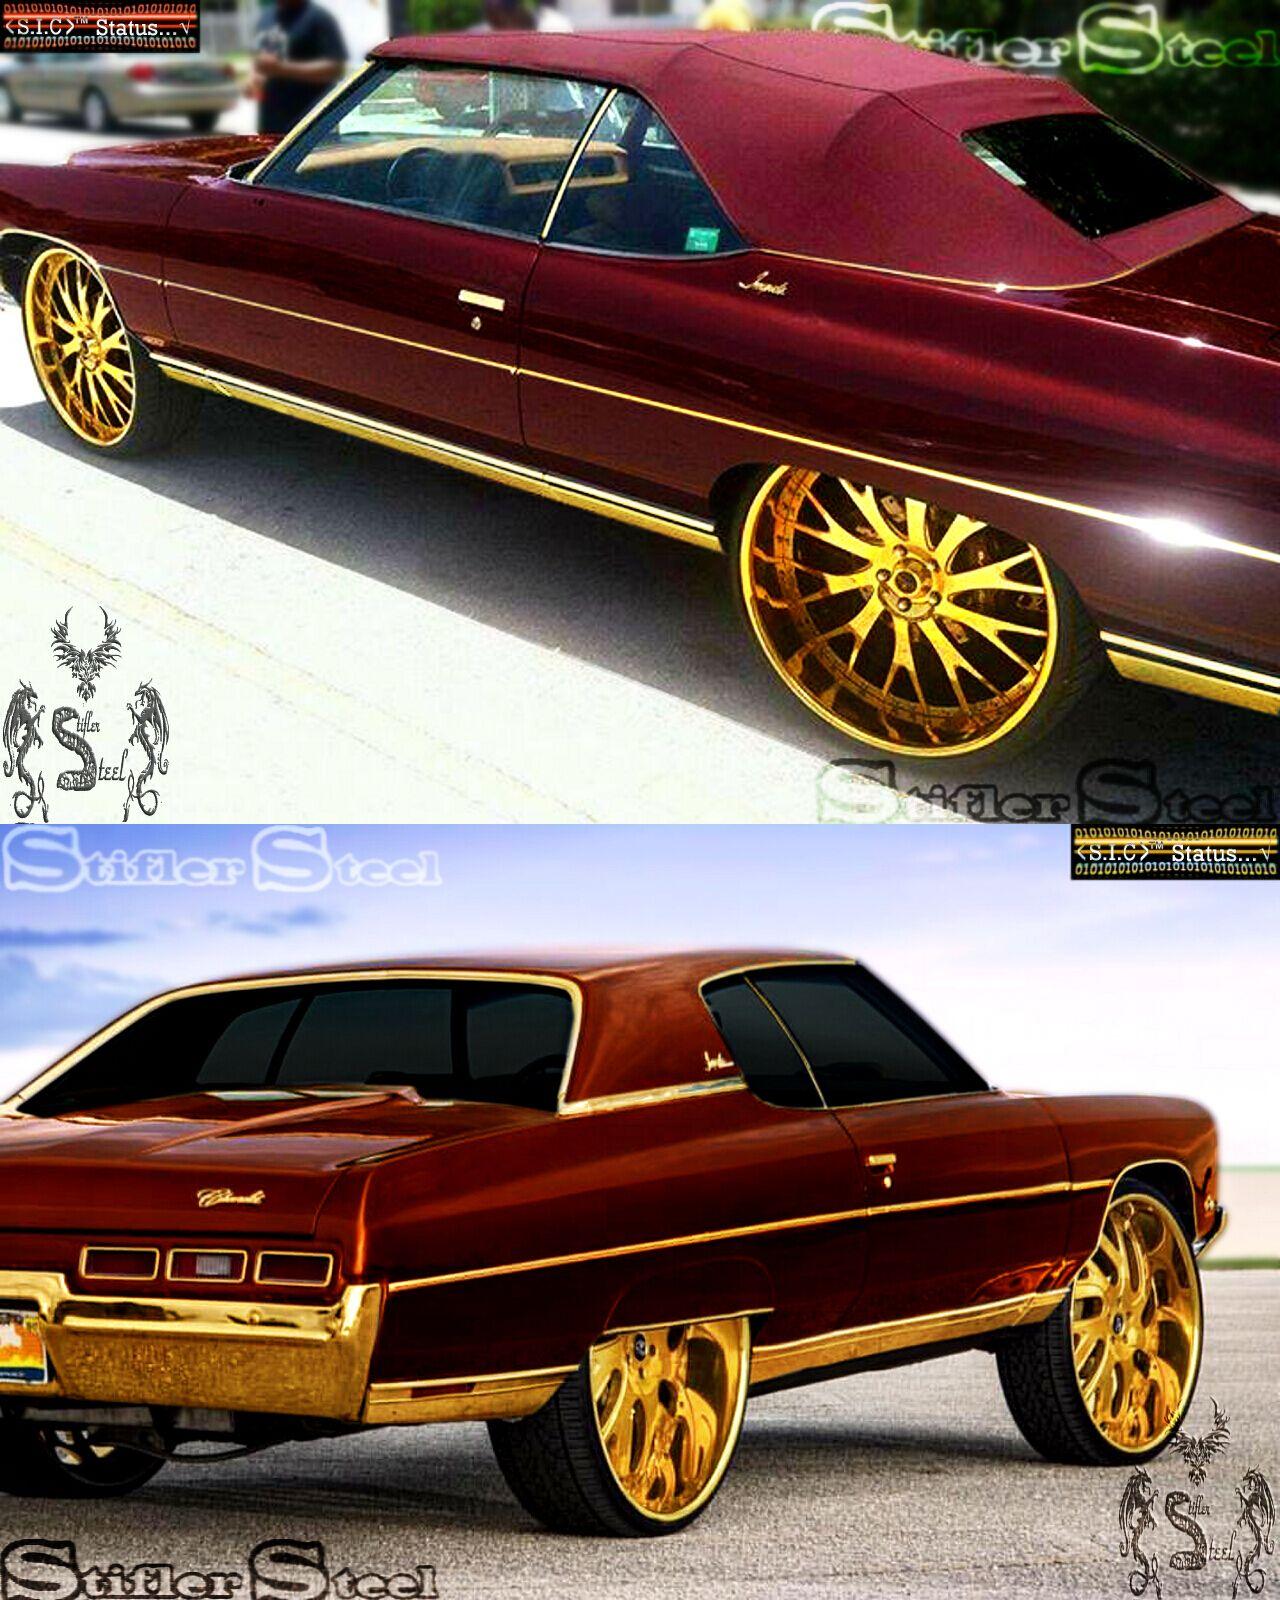 Golden Chevrolet : golden, chevrolet, Bottom, Golden, Finish, (Illustration), STIFLER, STEEL, GOLDEN, CONCEPTS, #StiflerSteel, #AtlantaWhips, #ATLwhips, Cars,, Classic, Chevy